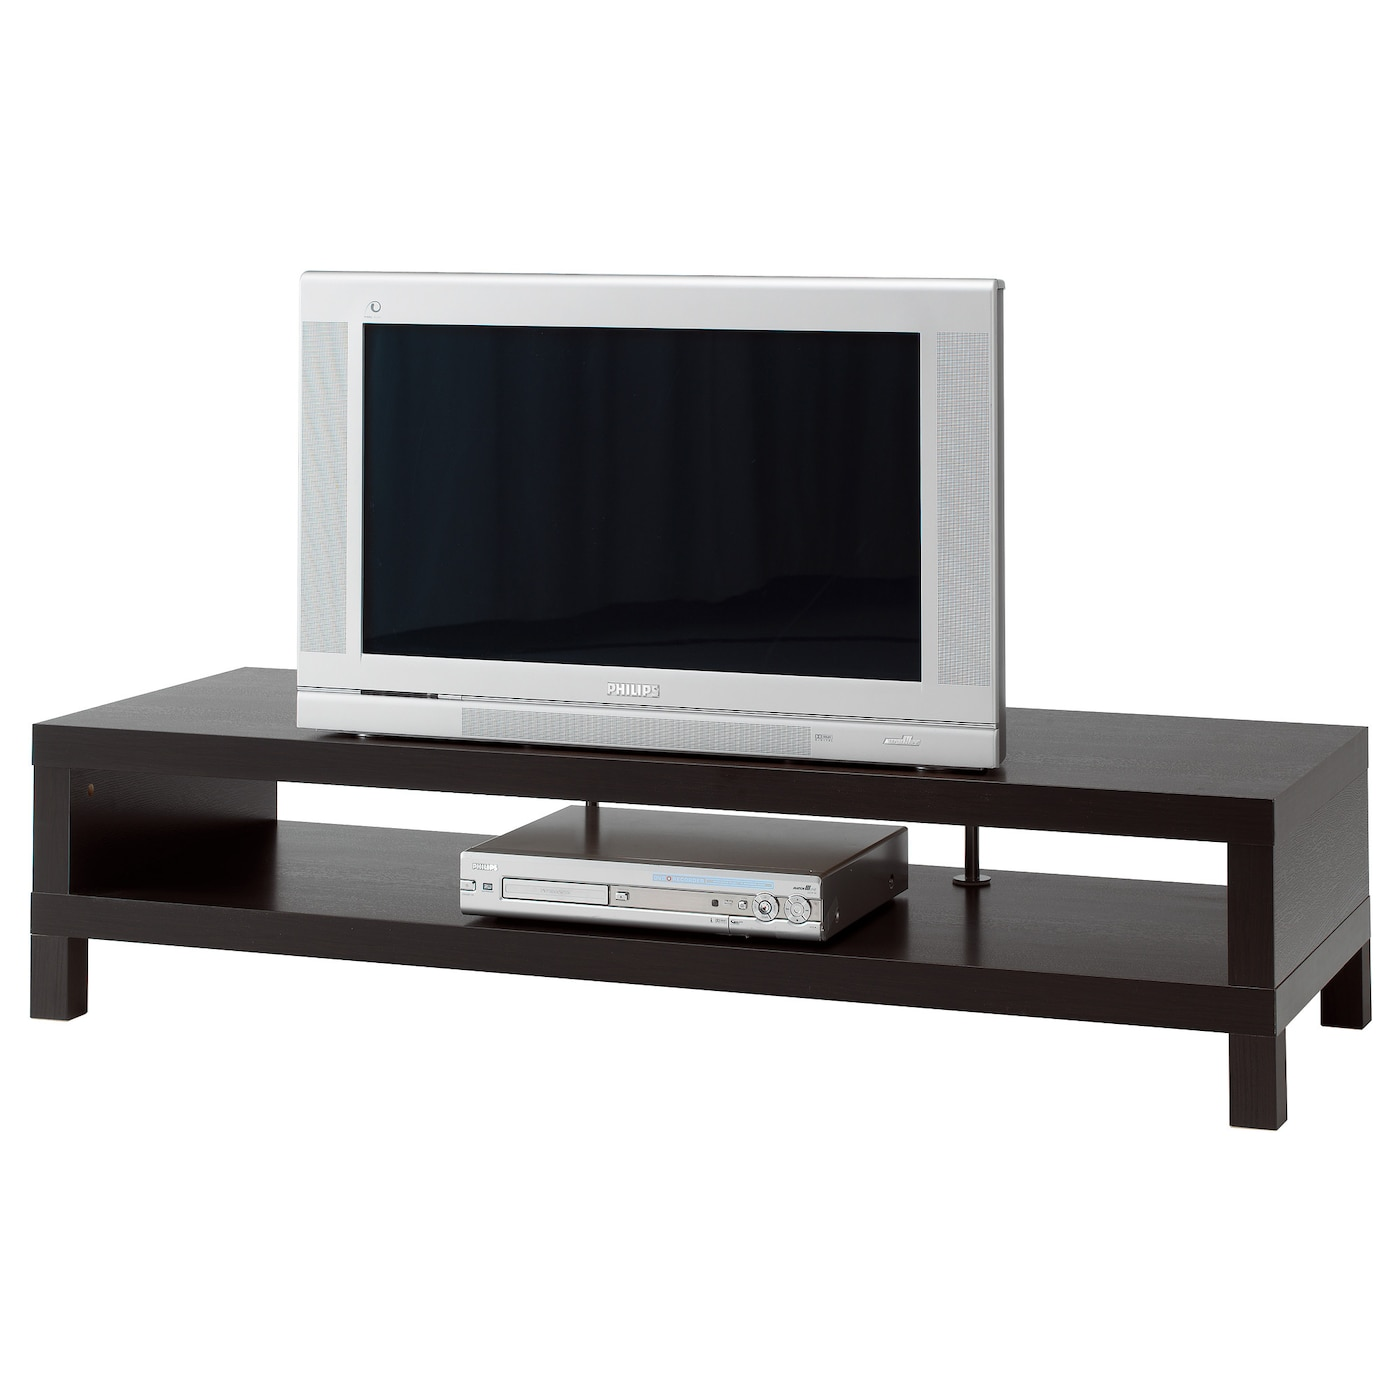 Lack Banc Tv Brun Noir 149×55 Cm Ikea # Meuble Tv Wenge Ikea